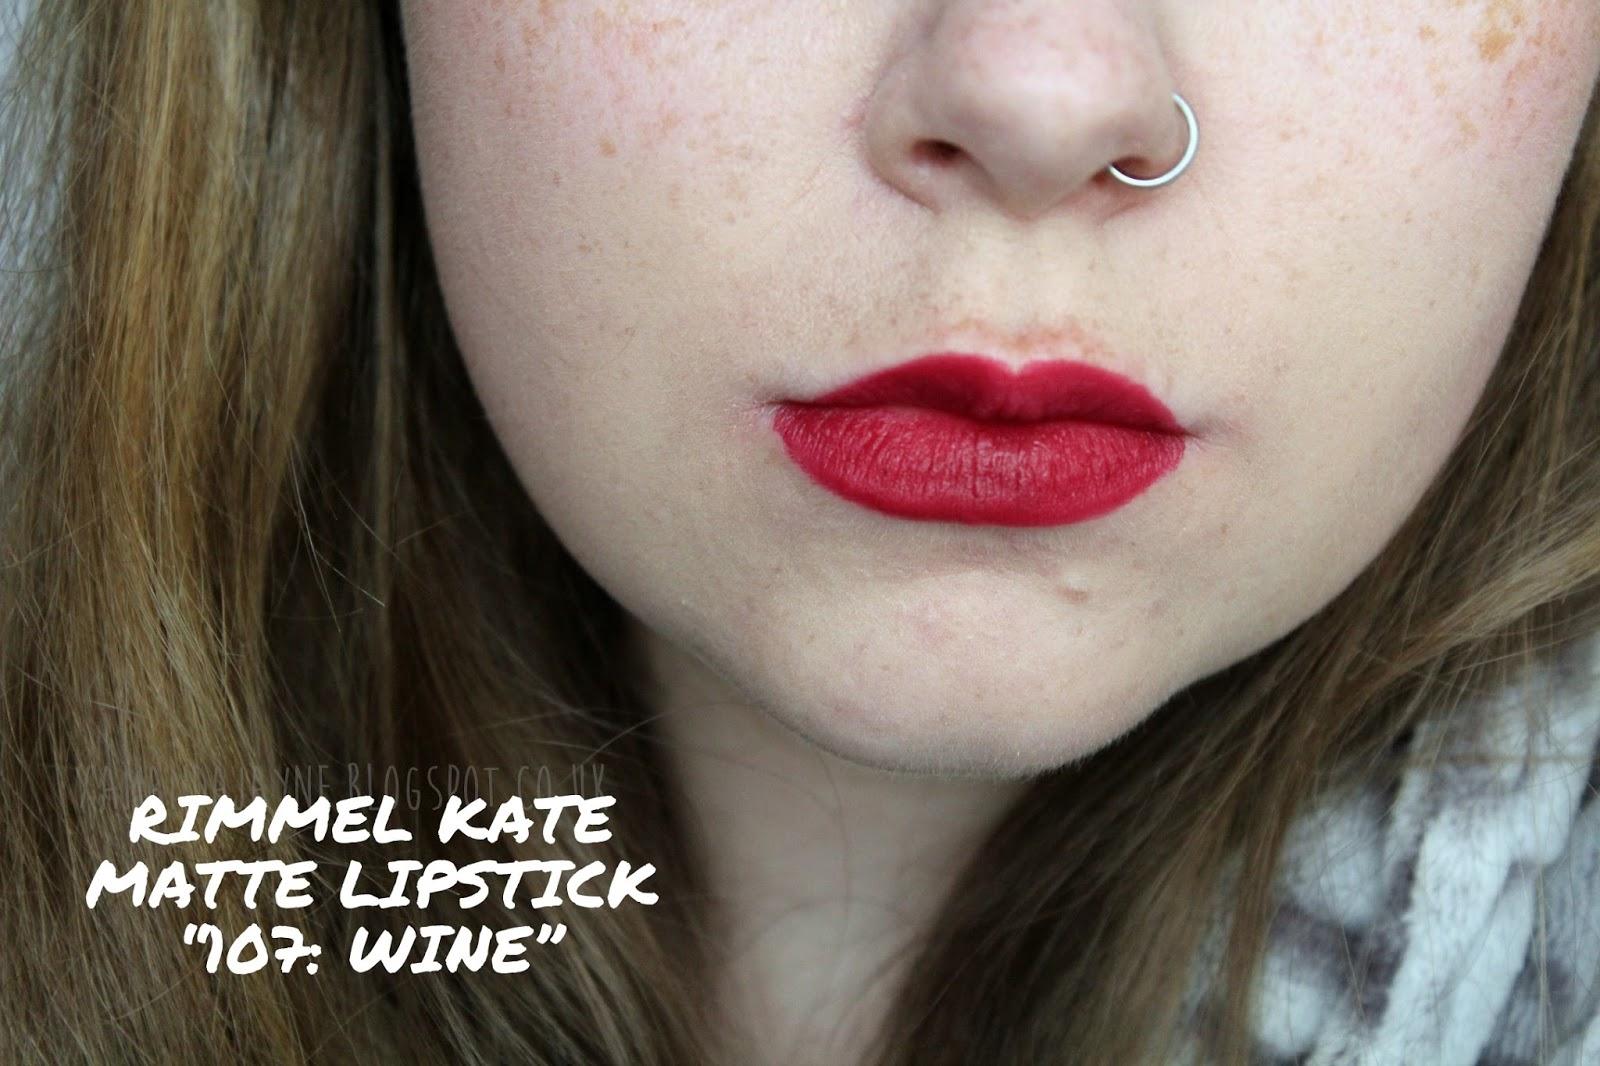 rimmel kate moss matte lipstick 107 wine swatch